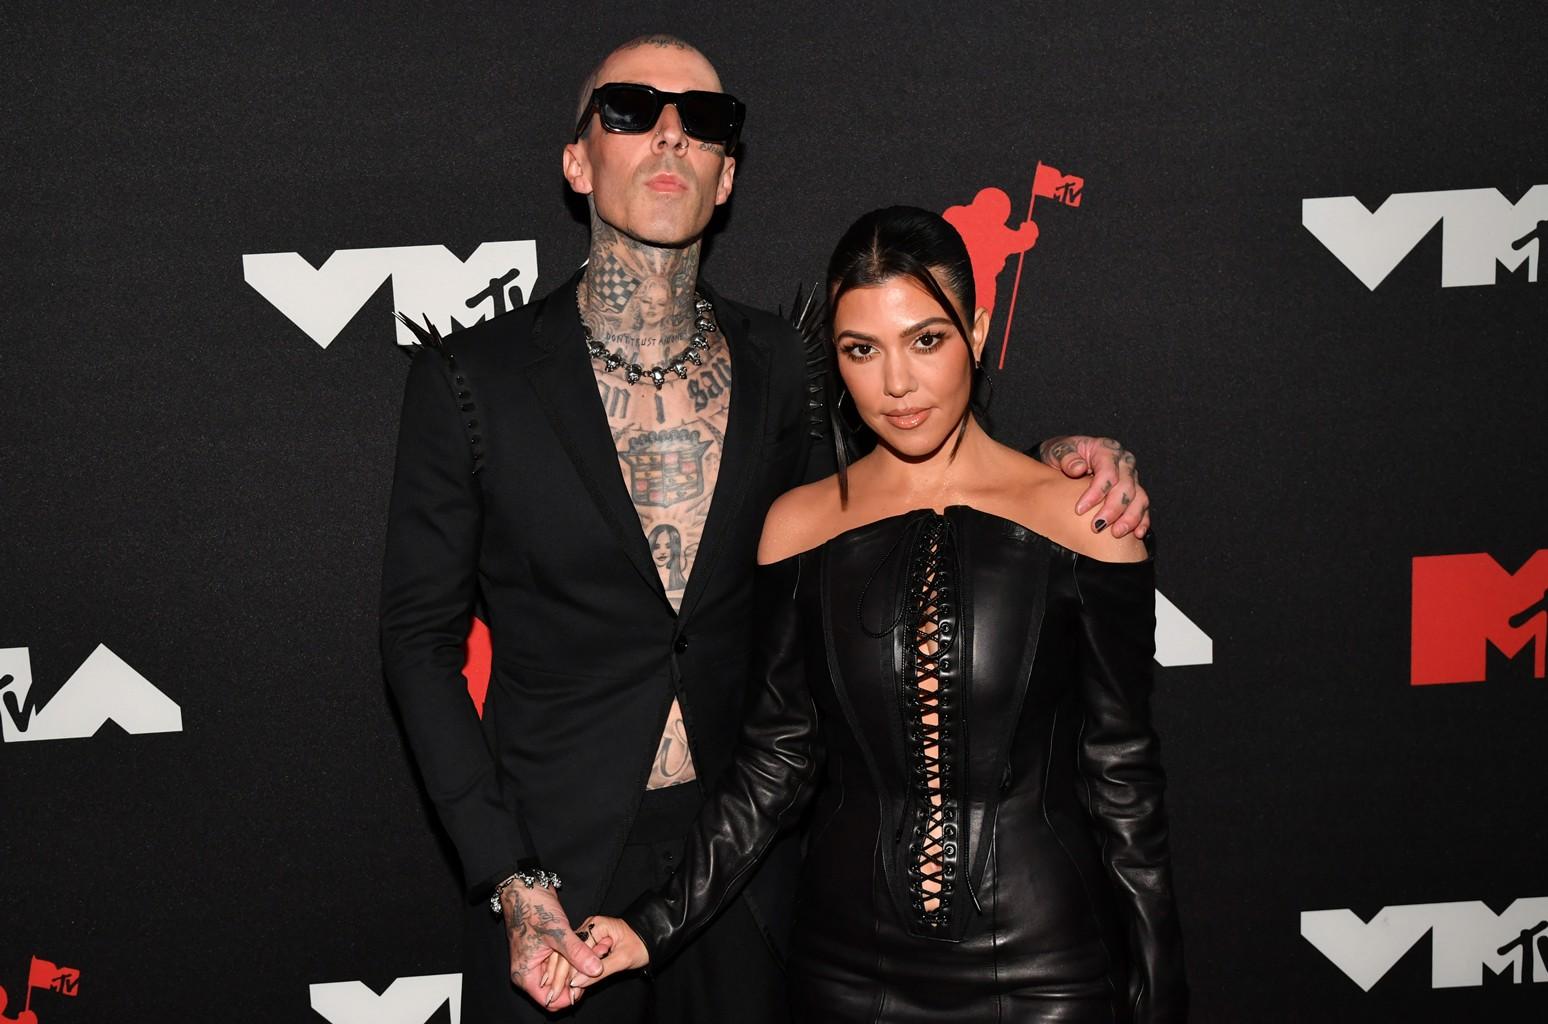 Kim Kardashian Shared First Look at Kourtney's Engagement Ring From Travis Barker